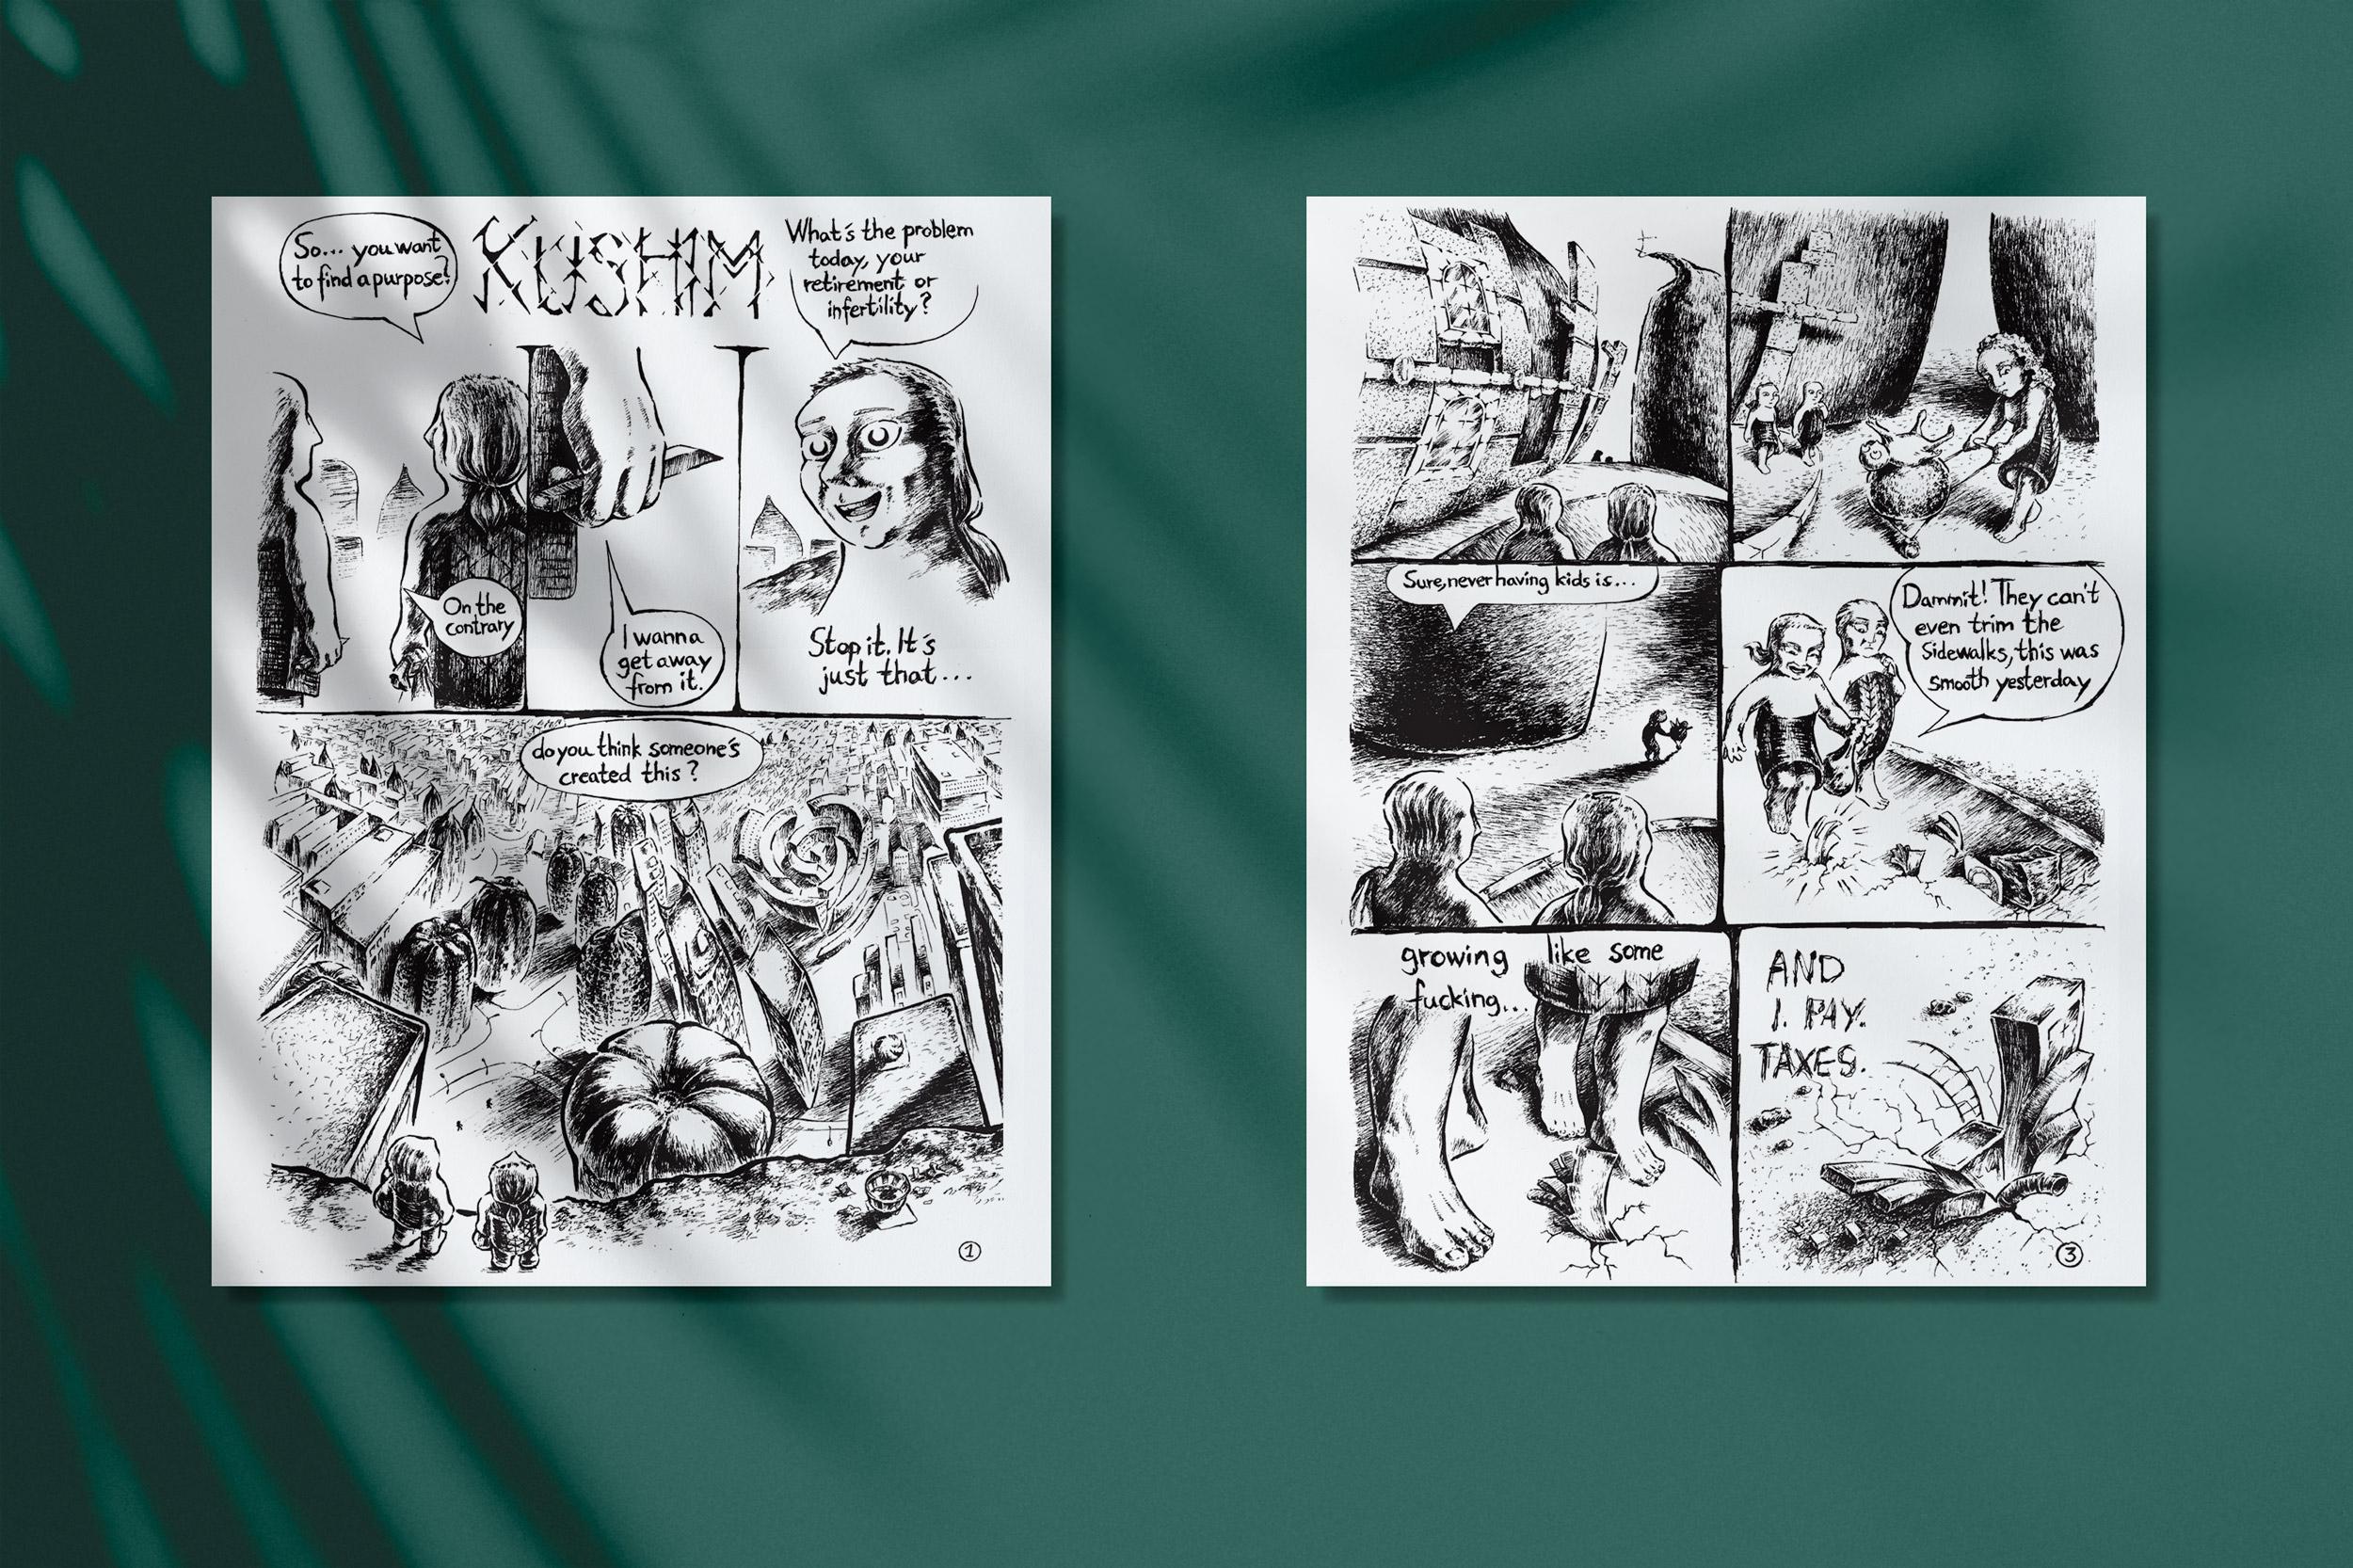 Kushim by Leviathan